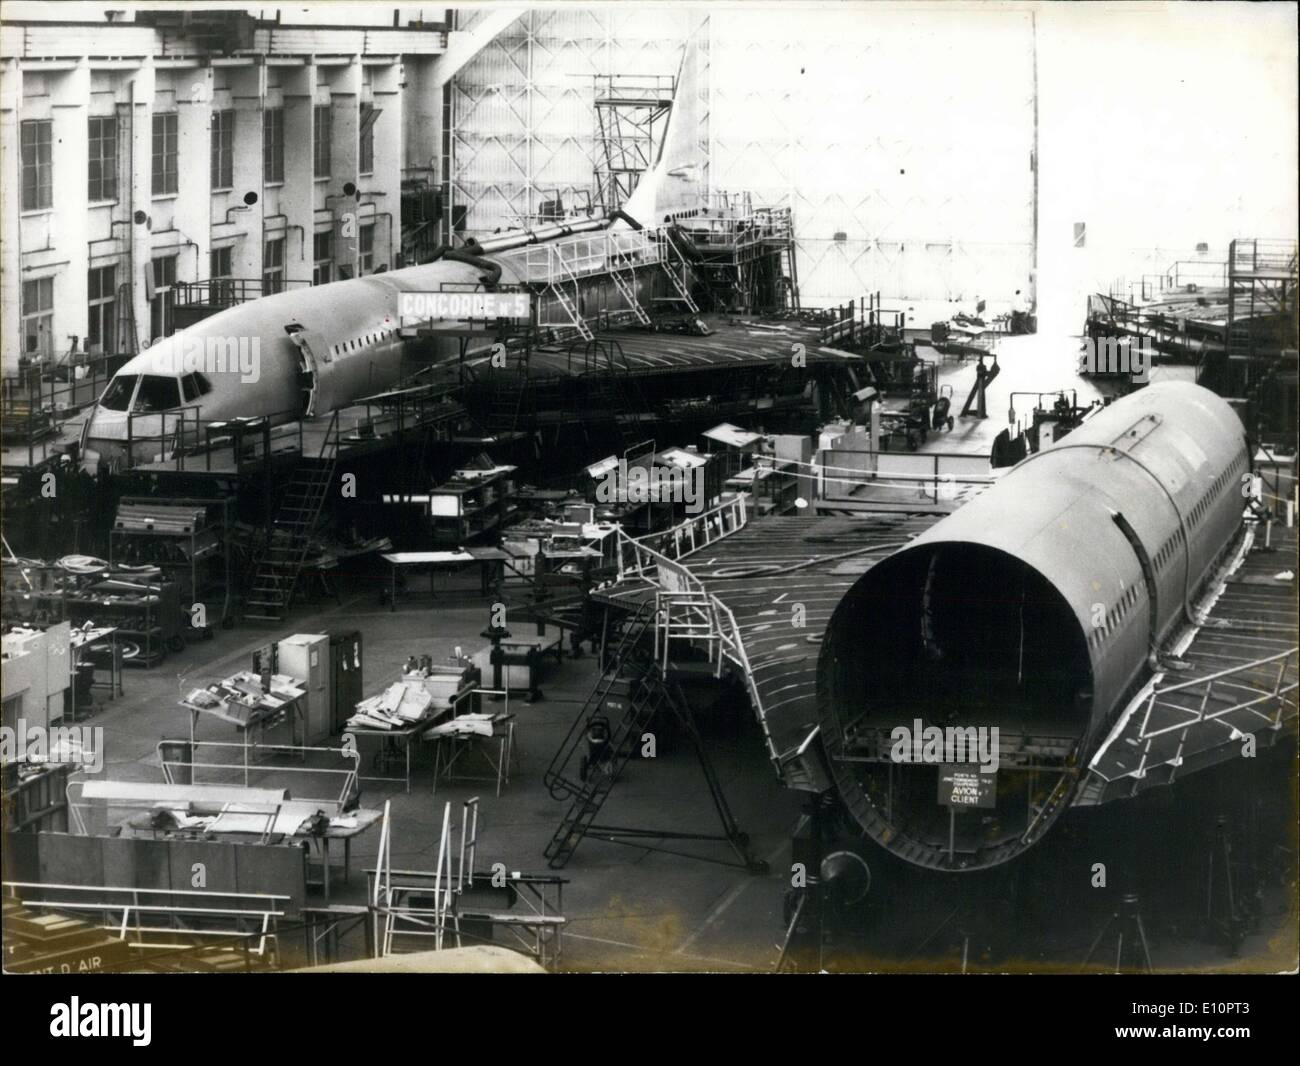 Nov. 28, 1973 - Building the ''Concord No.7'' Plane - Stock Image